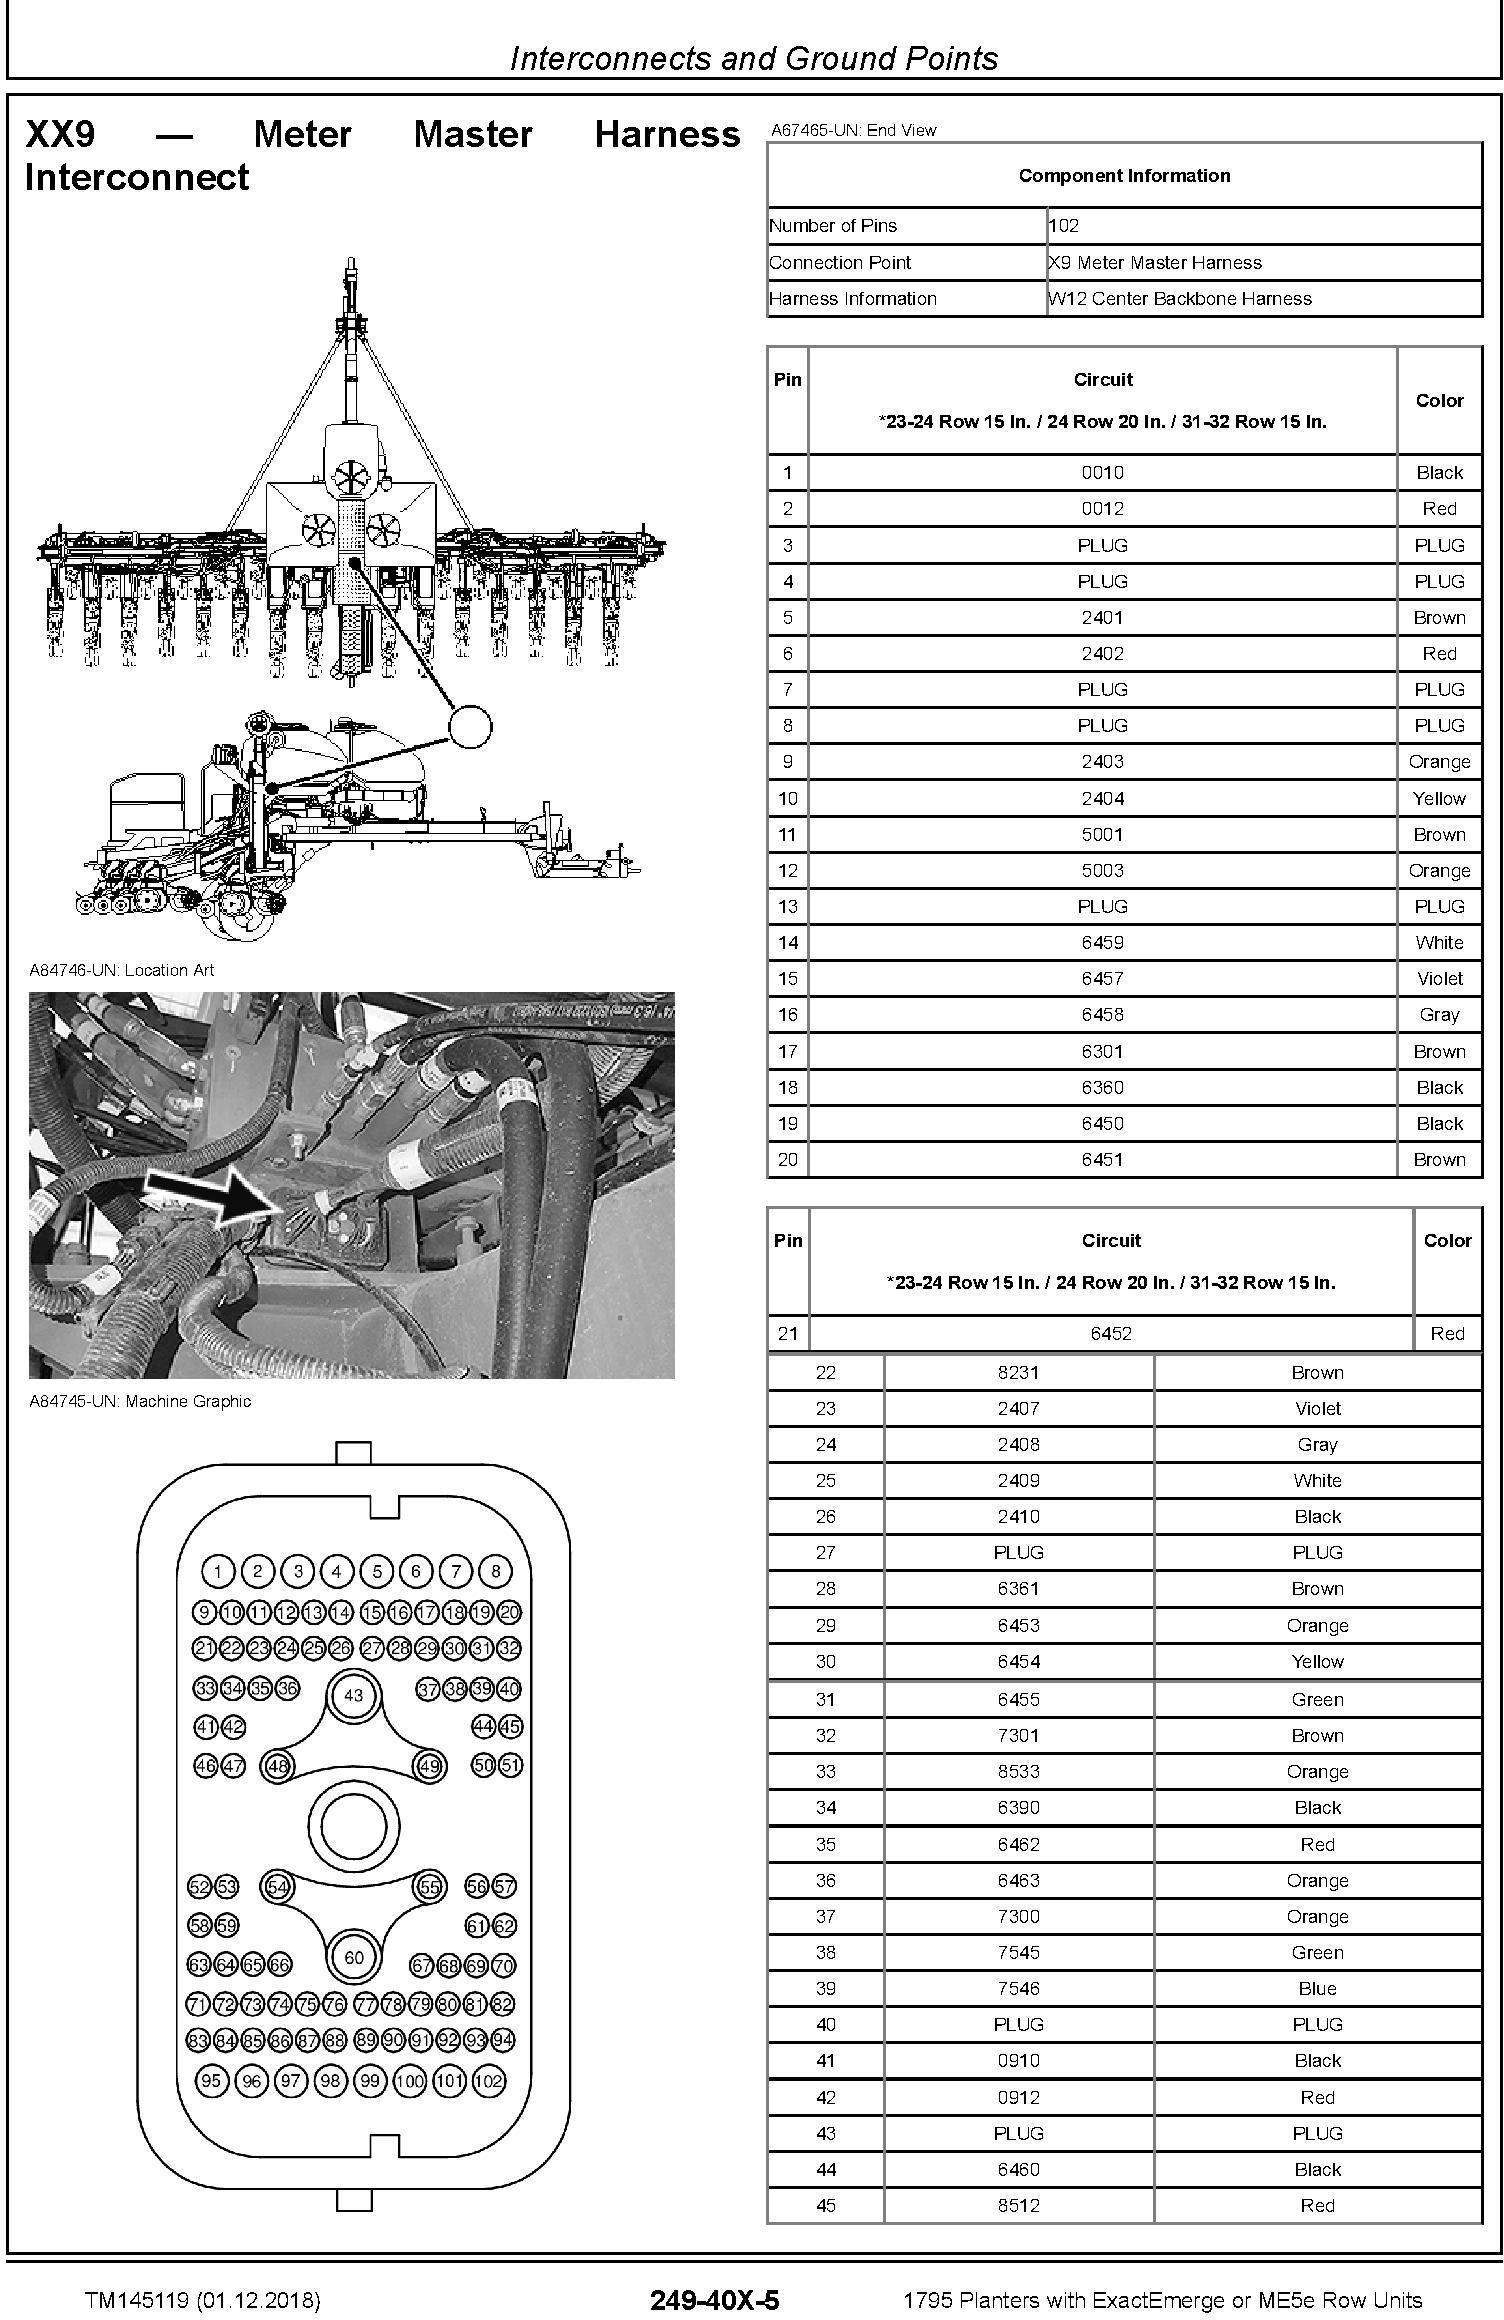 John Deere 1795 Planters with ExactEmerge or ME5e Row Units Diagnostic Technical Manual (TM145119) - 1